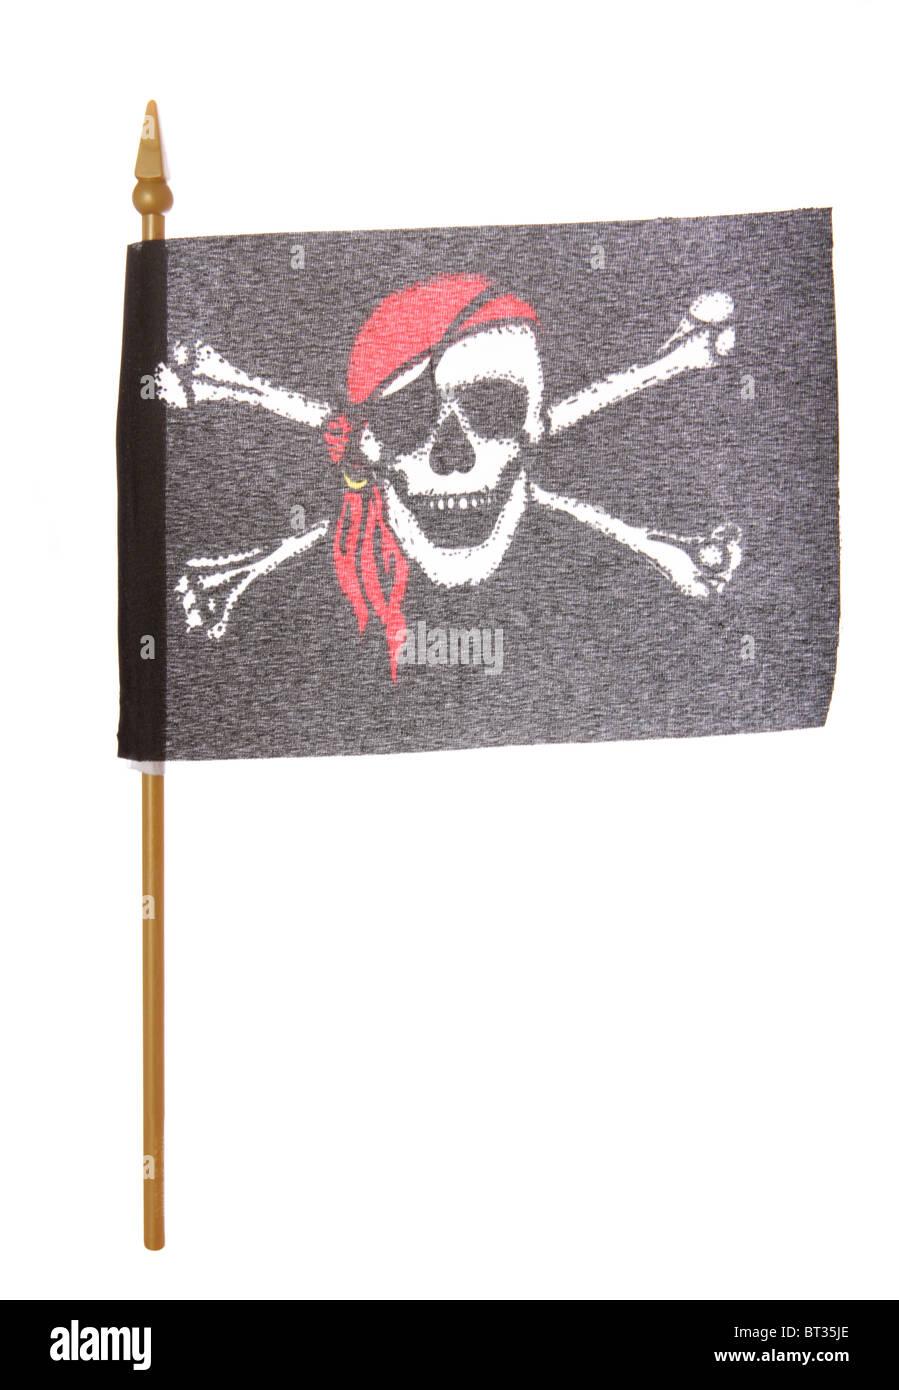 Toy Pirate flag studio cutout - Stock Image